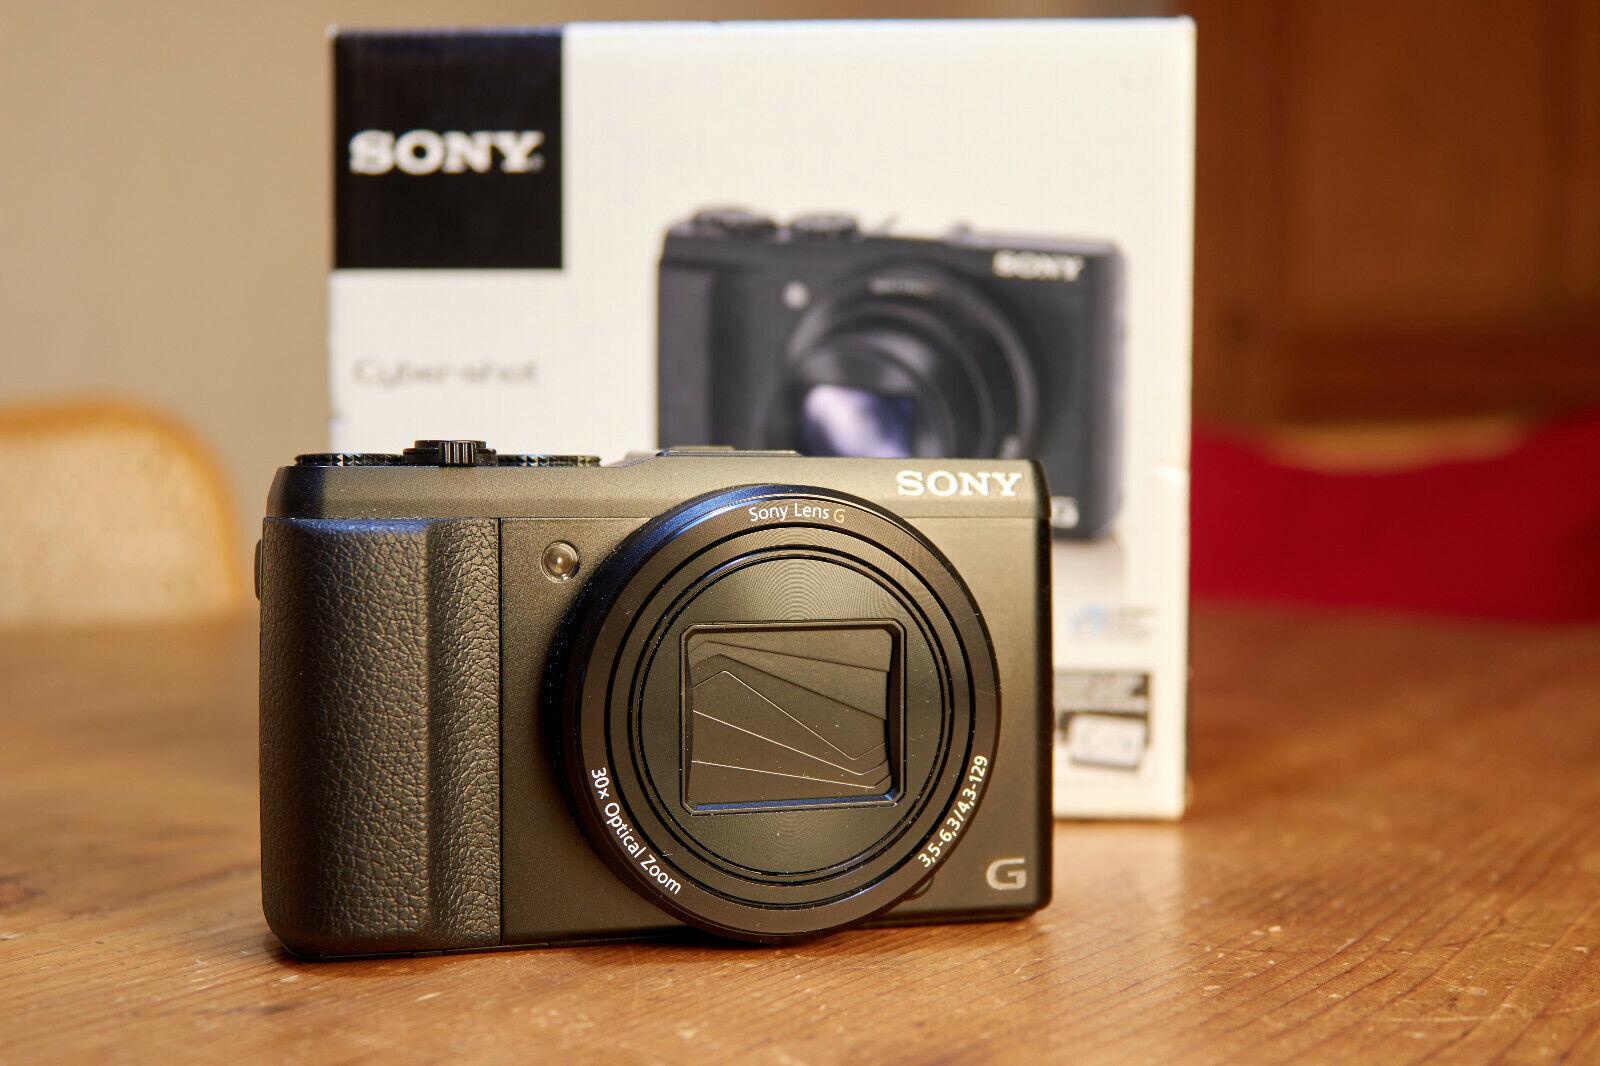 Sony Cybershot DSC-HX50 DSC HX 50  Digitalkamera Superzoom